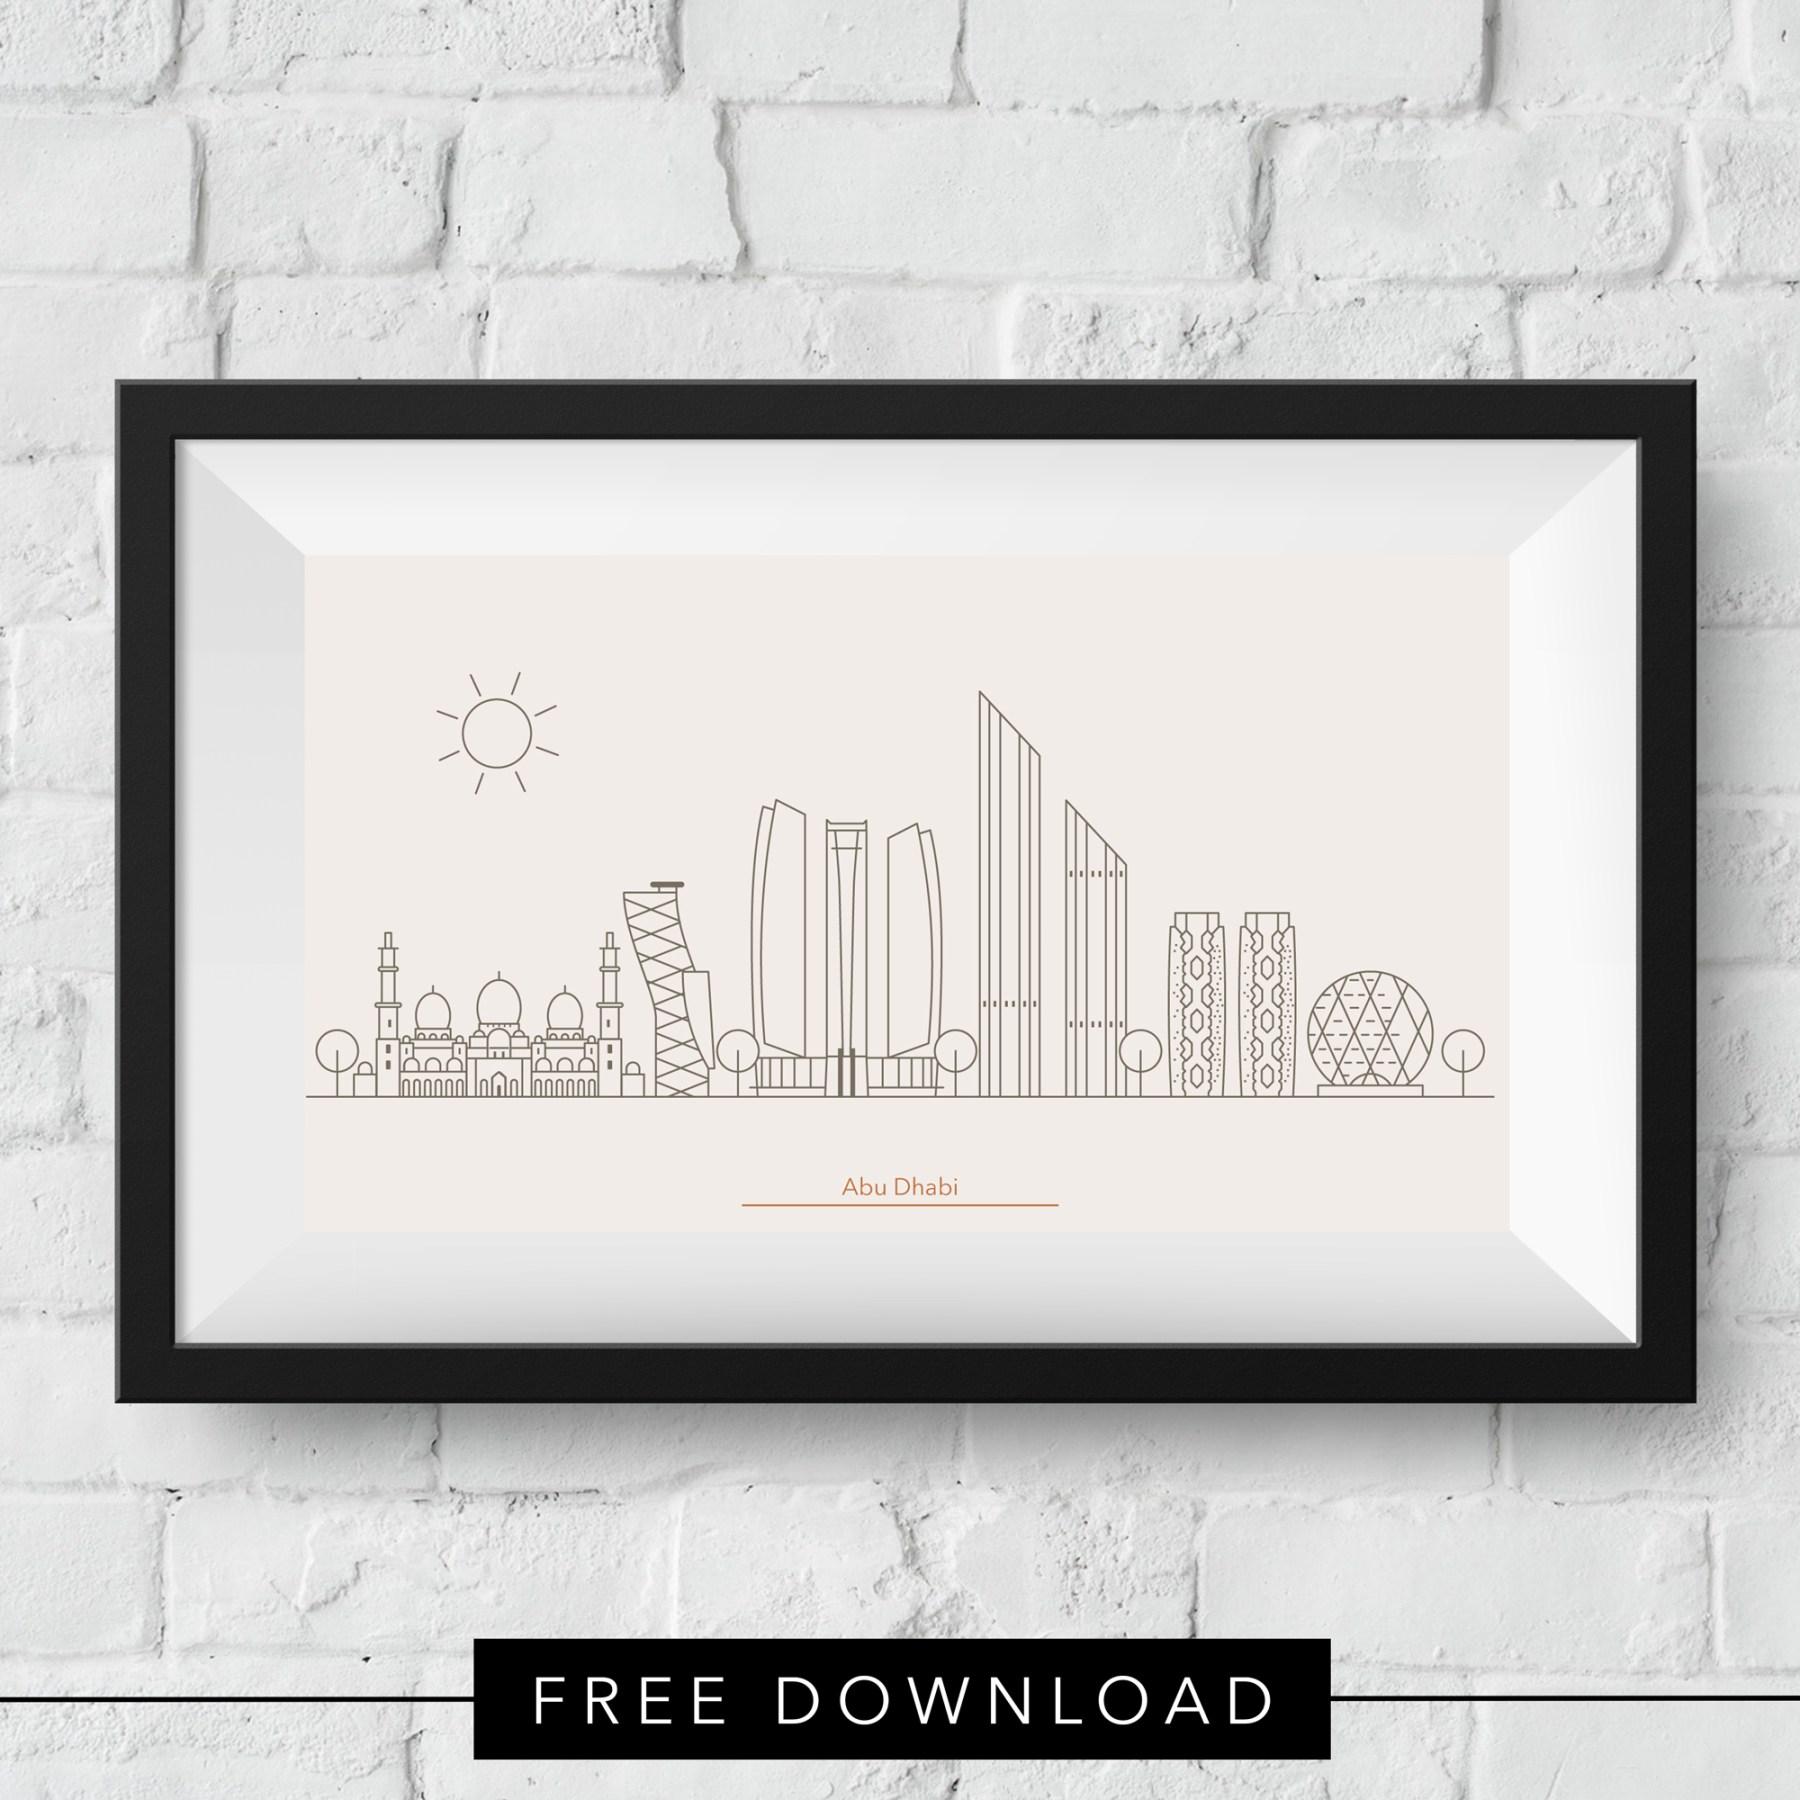 abu-dhabi-skyline-free-download